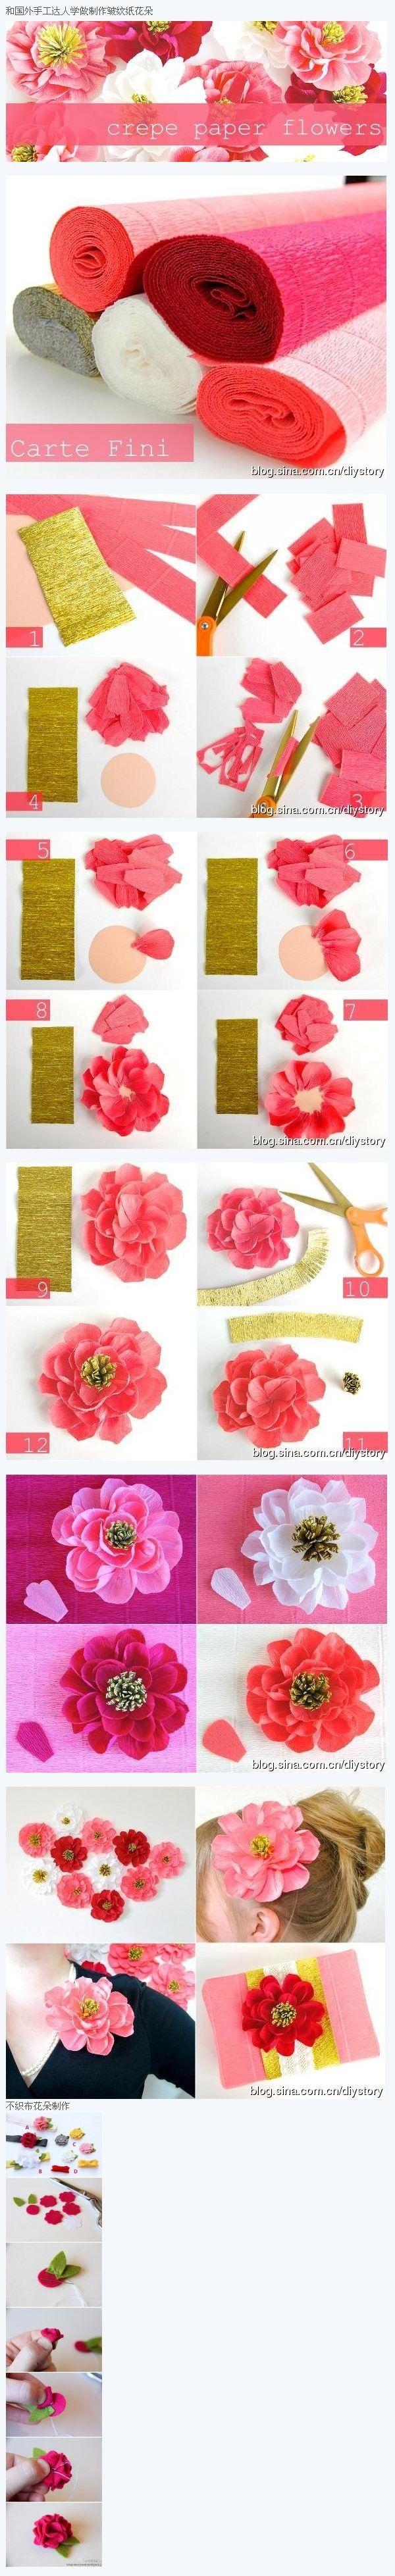 276 best dobraduras e origami images on pinterest bricolage crepe paper flower jeuxipadfo Gallery